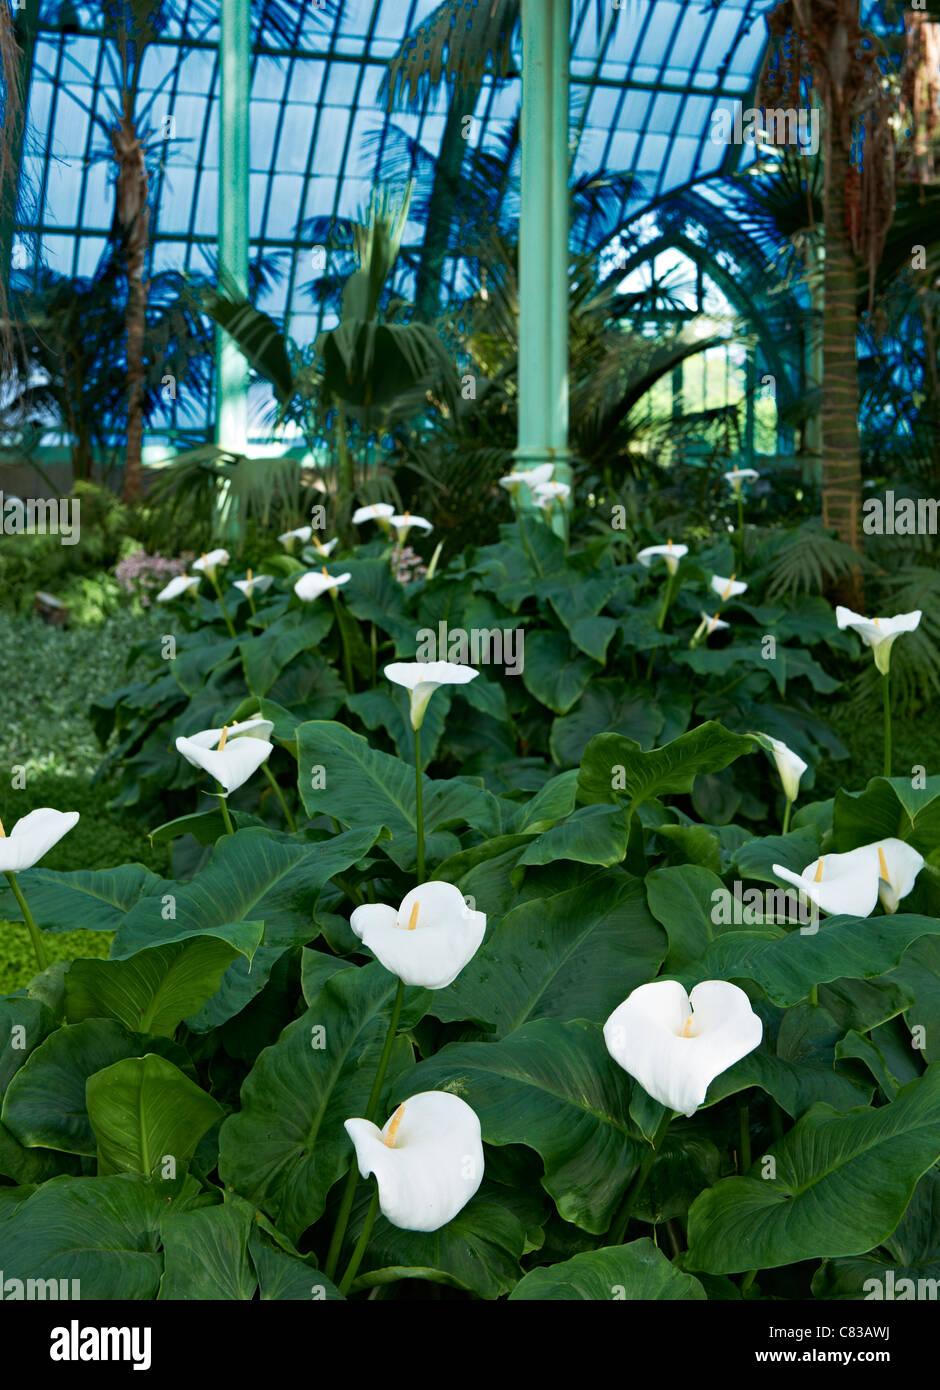 Arum or calla lilies, Zantedeschia aethiopica, Royal Greenhouses of Laeken, Royal Castle of Laeken, Brussels, Belgium, - Stock Image